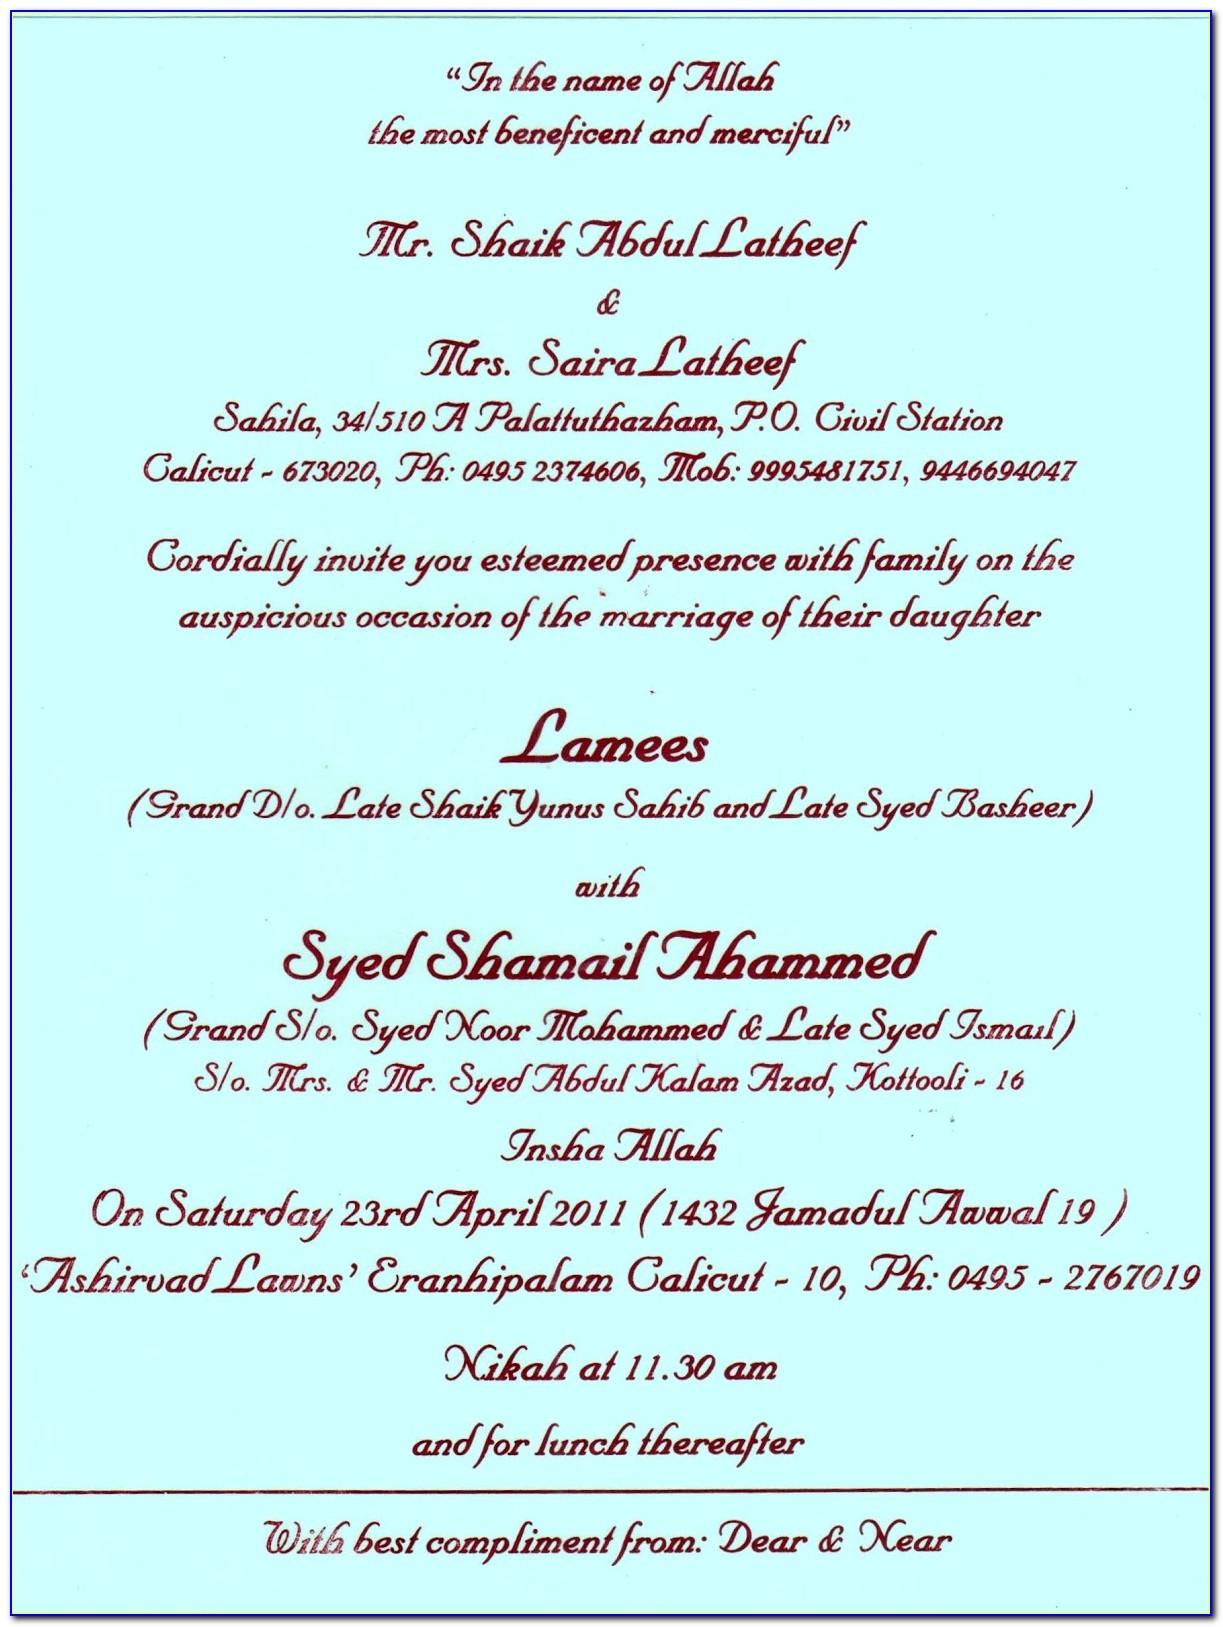 Kerala Christian Wedding Cards Matter